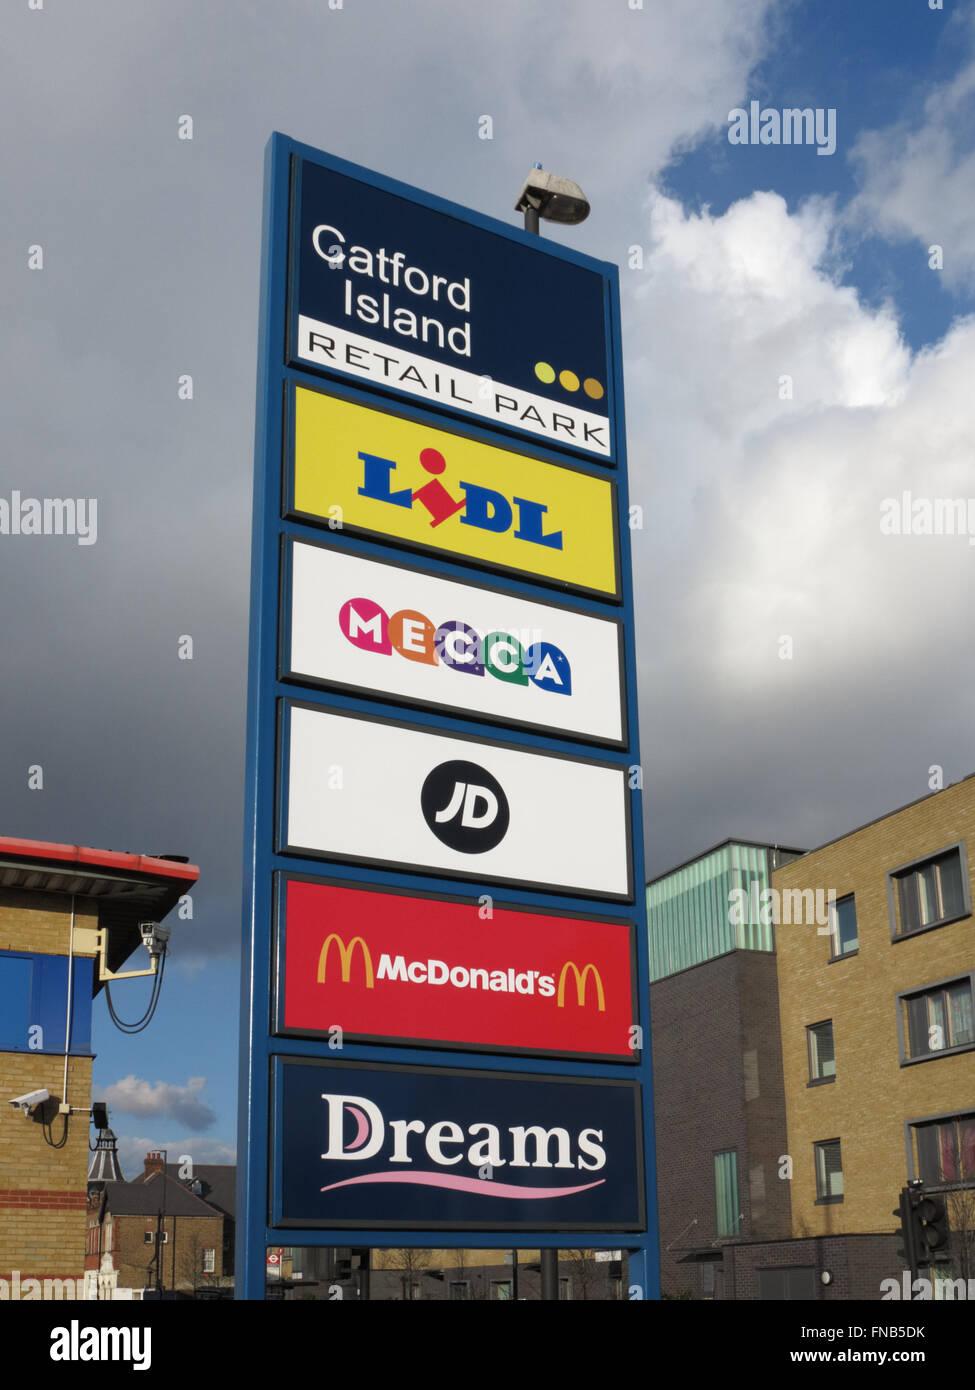 Catford Island Retail Park - Stock Image